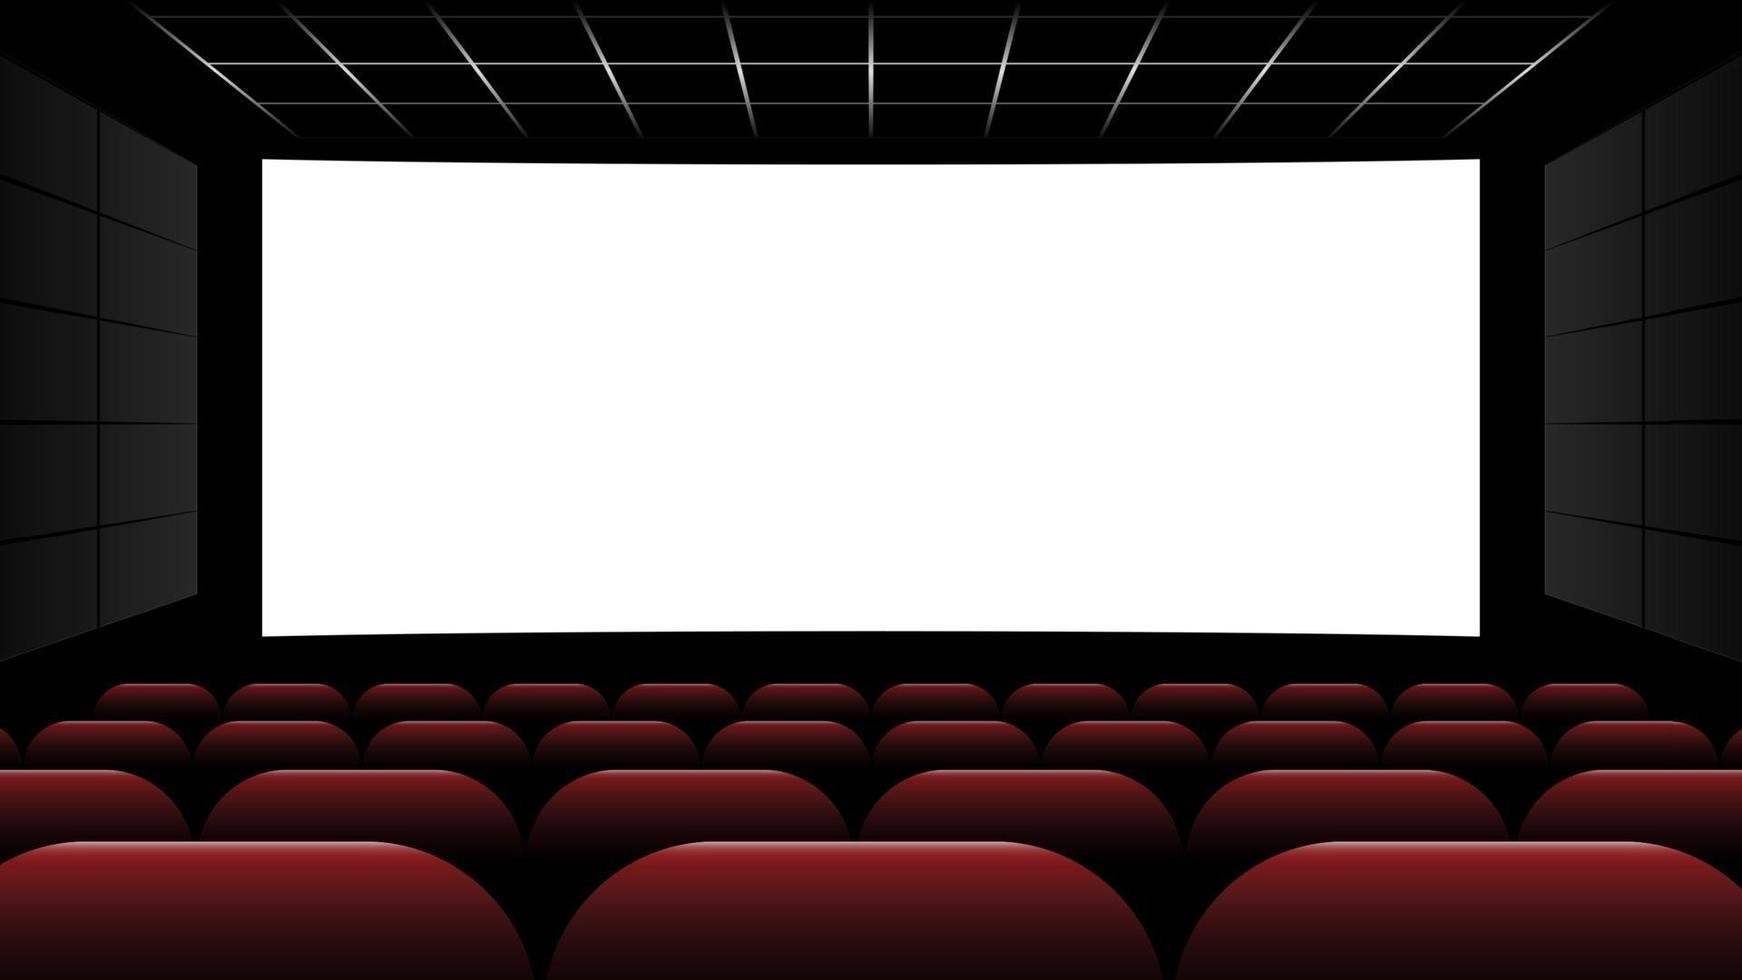 Kino Kino mit leerem Bildschirm und roten Sitzen, Vektorillustration vektor